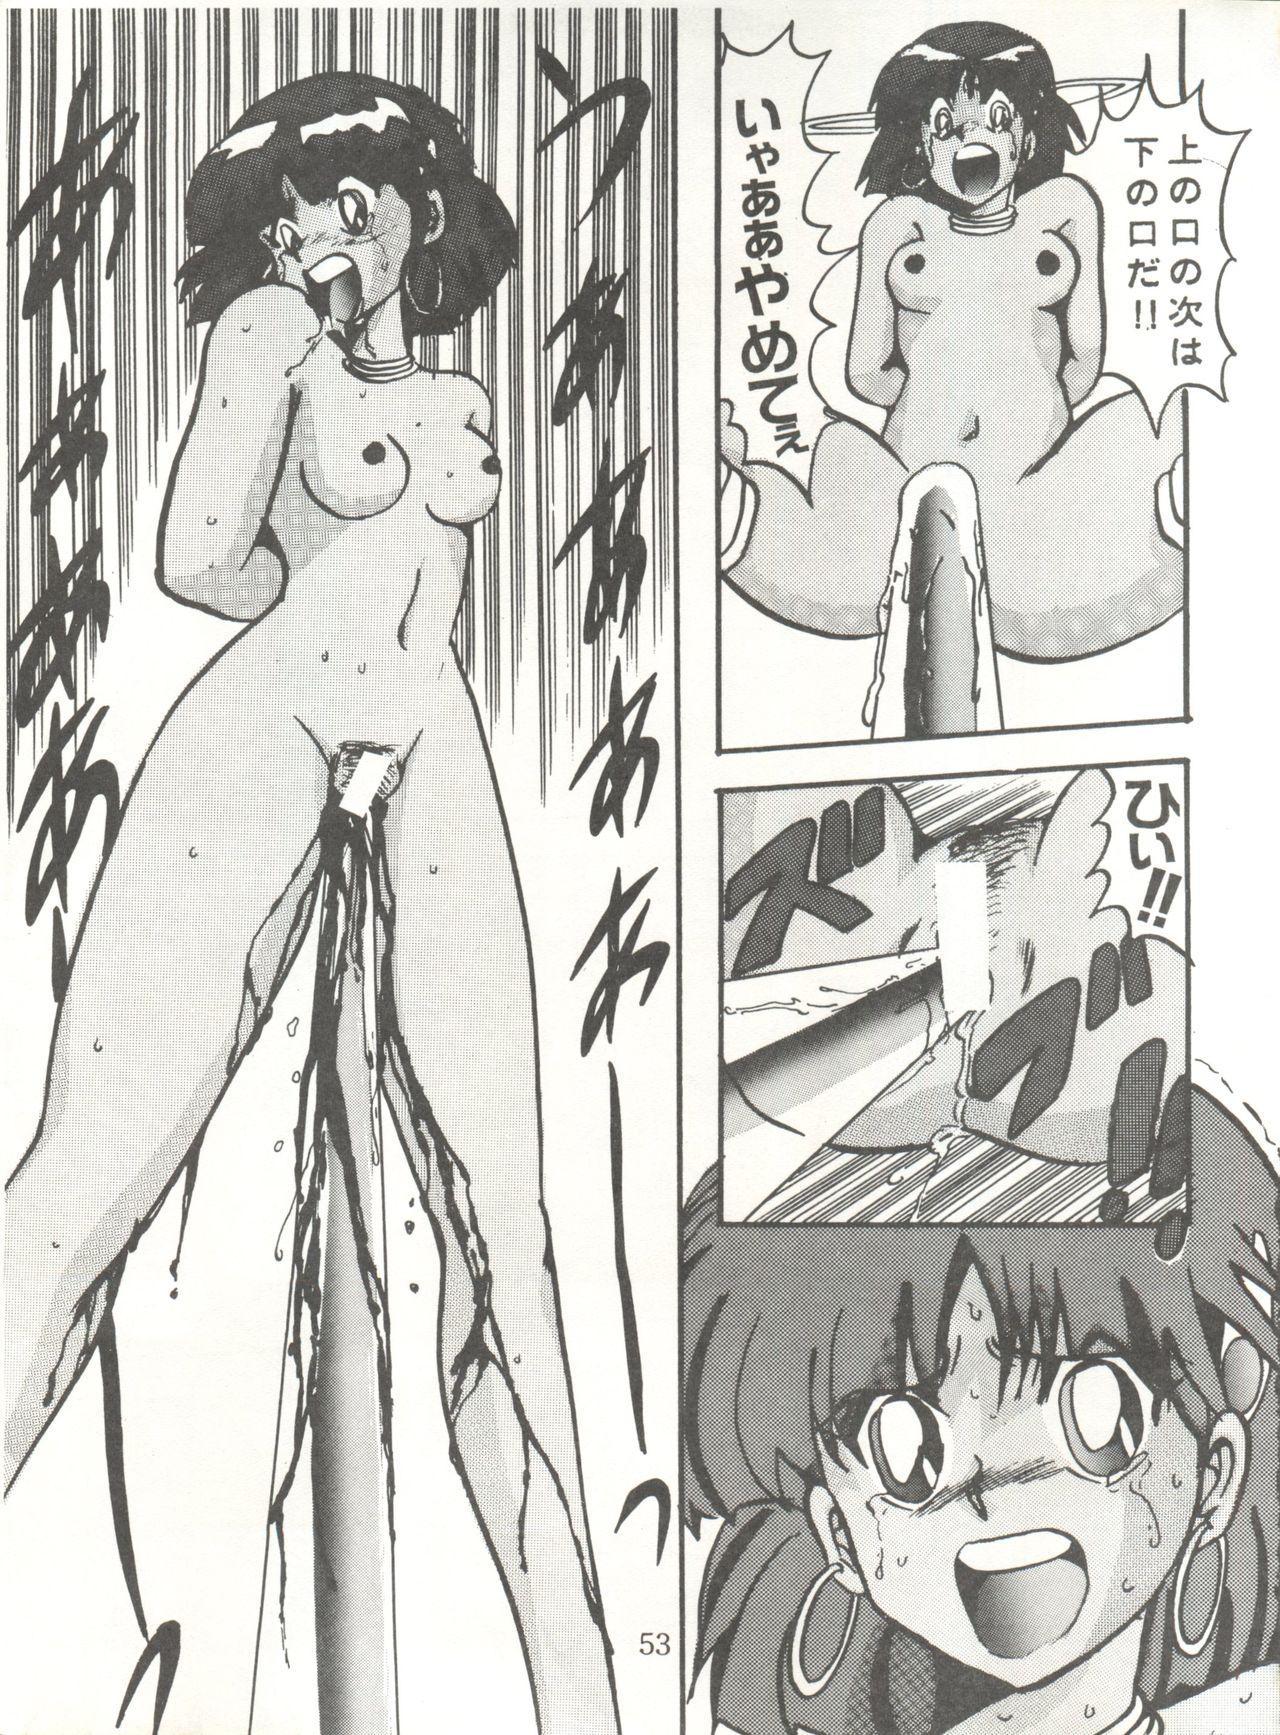 [Global One (MARO)] Sadistic 5 (Cutey Honey, Devilman, Sailor Moon), [Global One (MARO)] Sadistic (Dirty Pair, Fushigi no Umi no Nadia, Sailor Moon), [Studio Ikkatsumajin] .ribbon (Hime-chan's Ribbon) 112